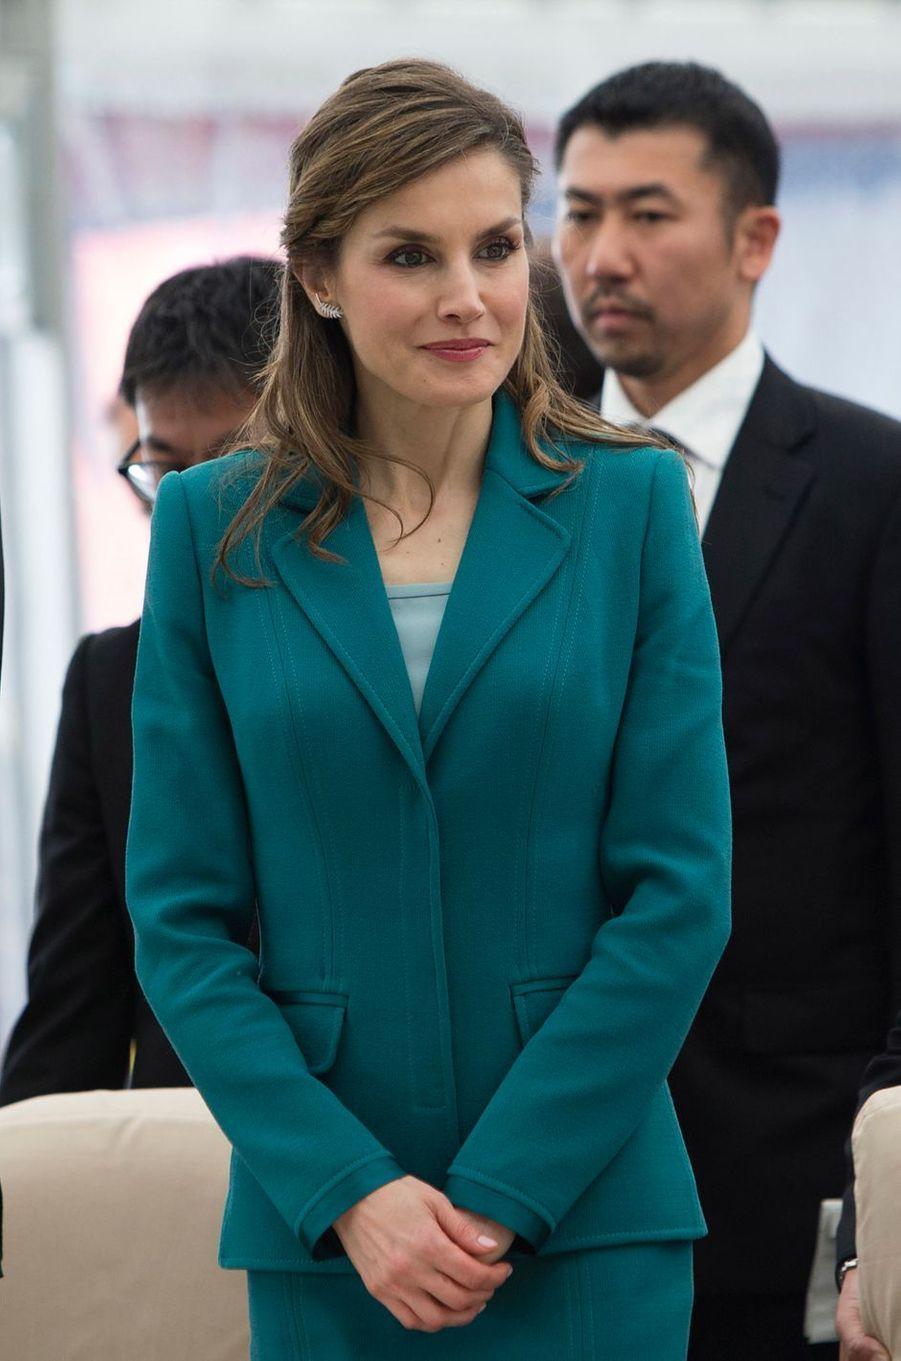 La reine Letizia d'Espagne à Shizuoka, le 7 avril 2017